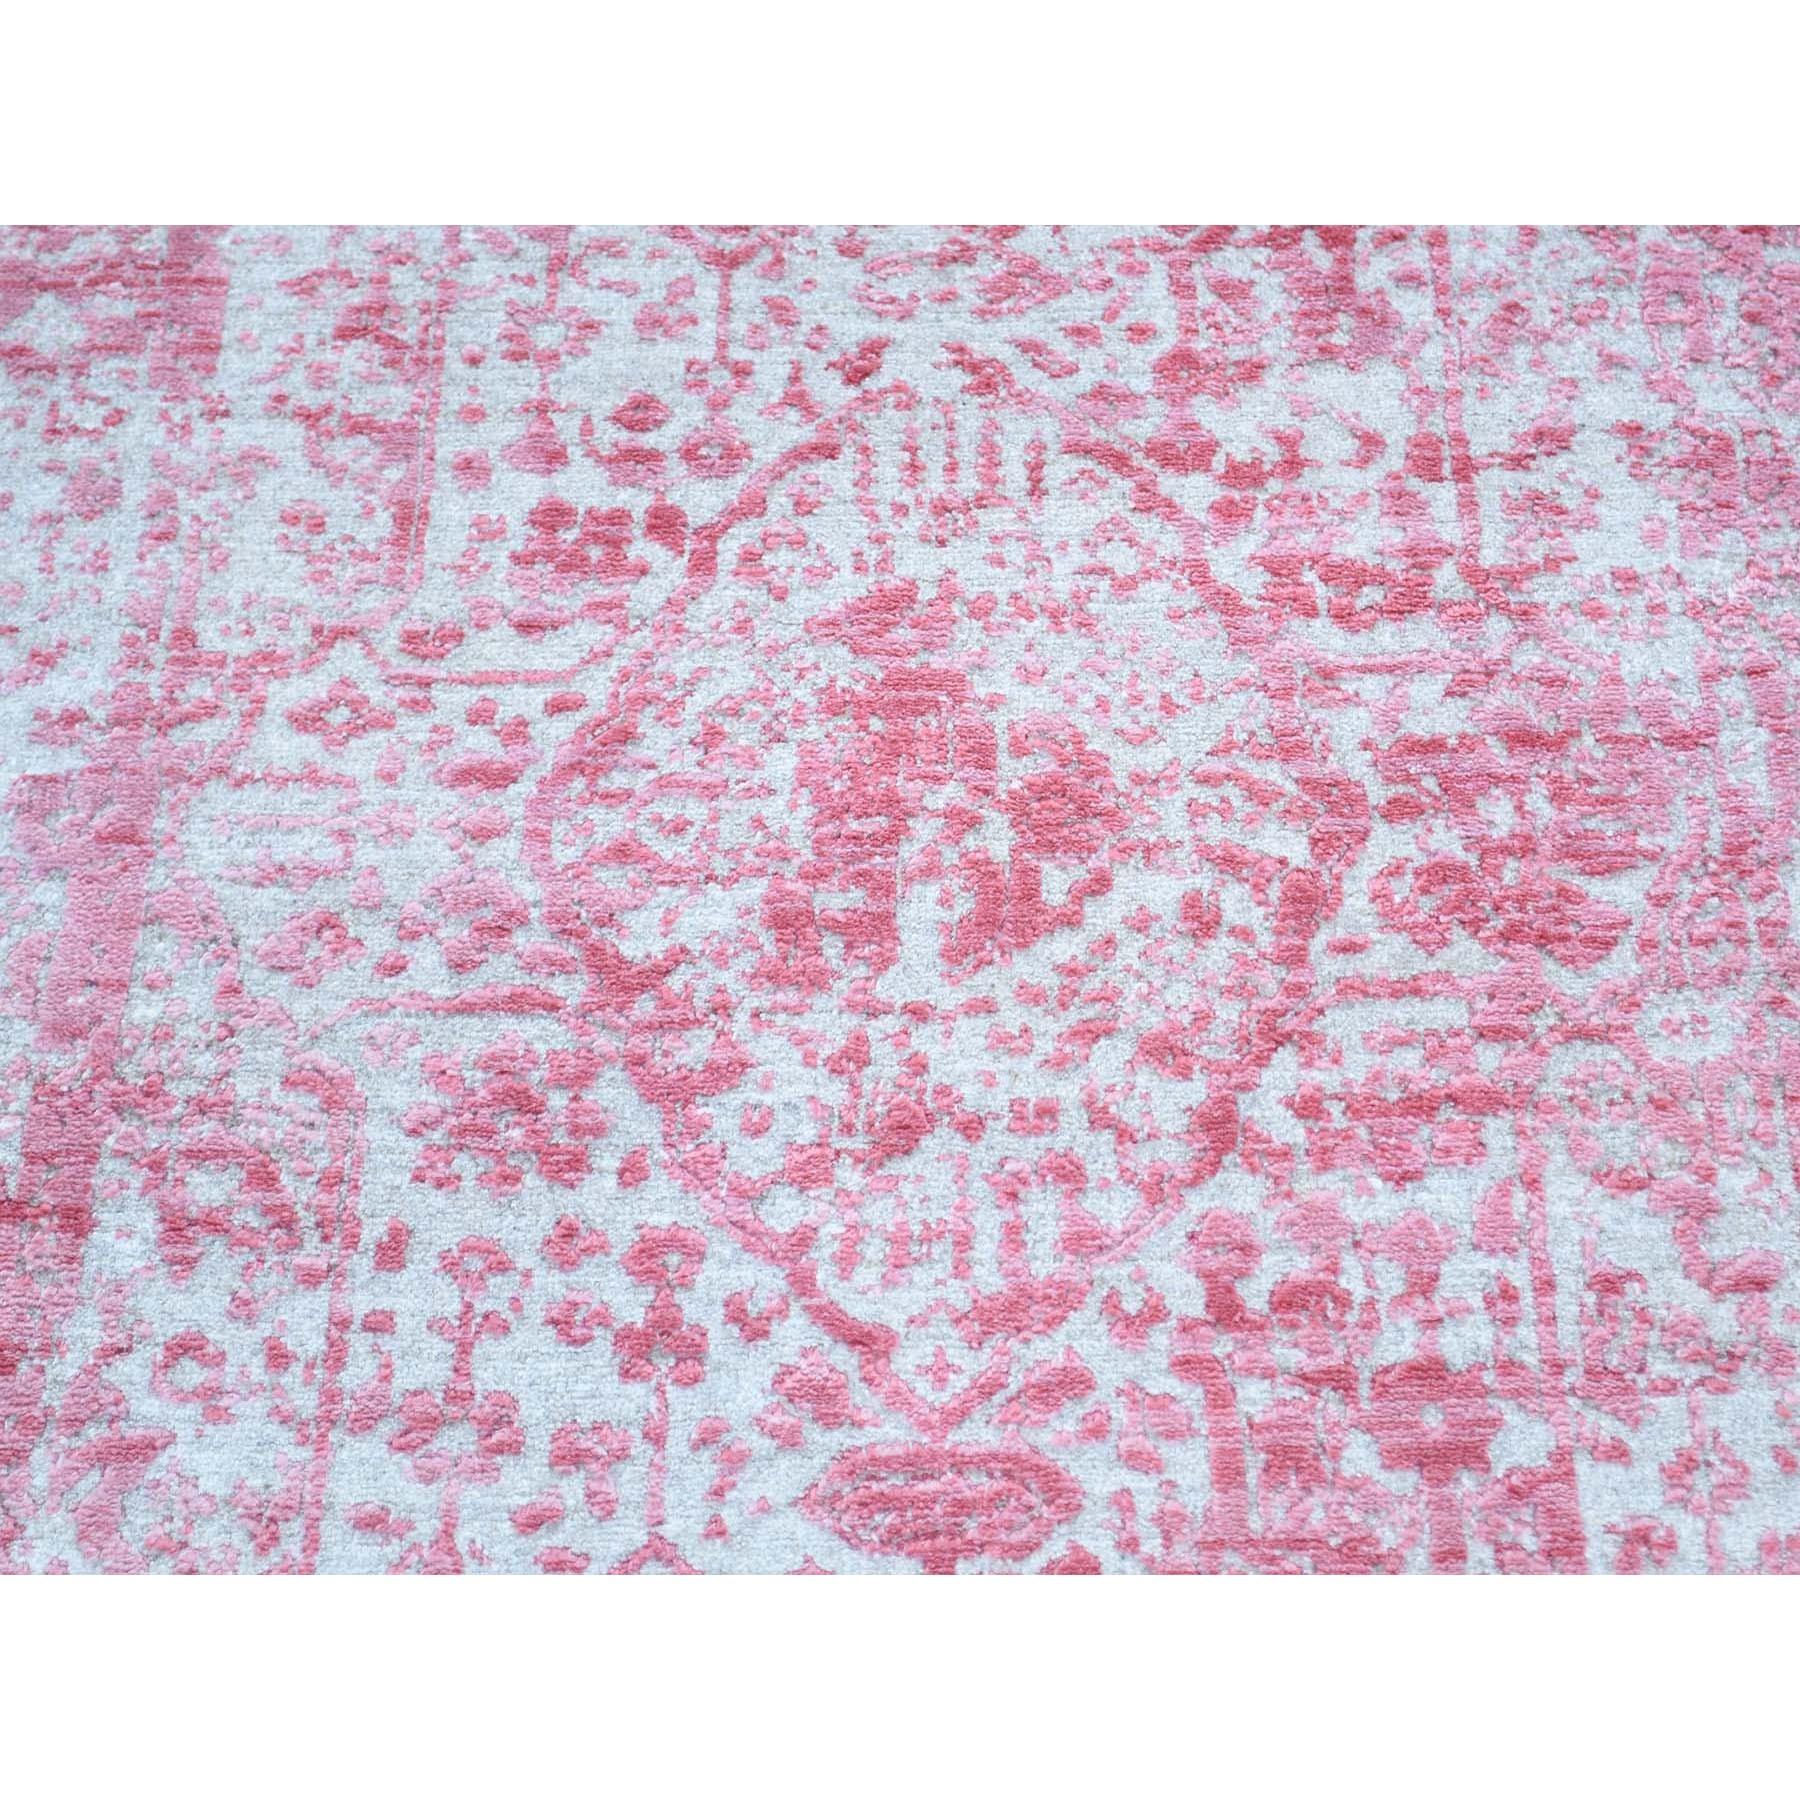 "2'6""x13'6"" Hand-Knotted Wool and Silk Runner Broken Persian Design Rug"